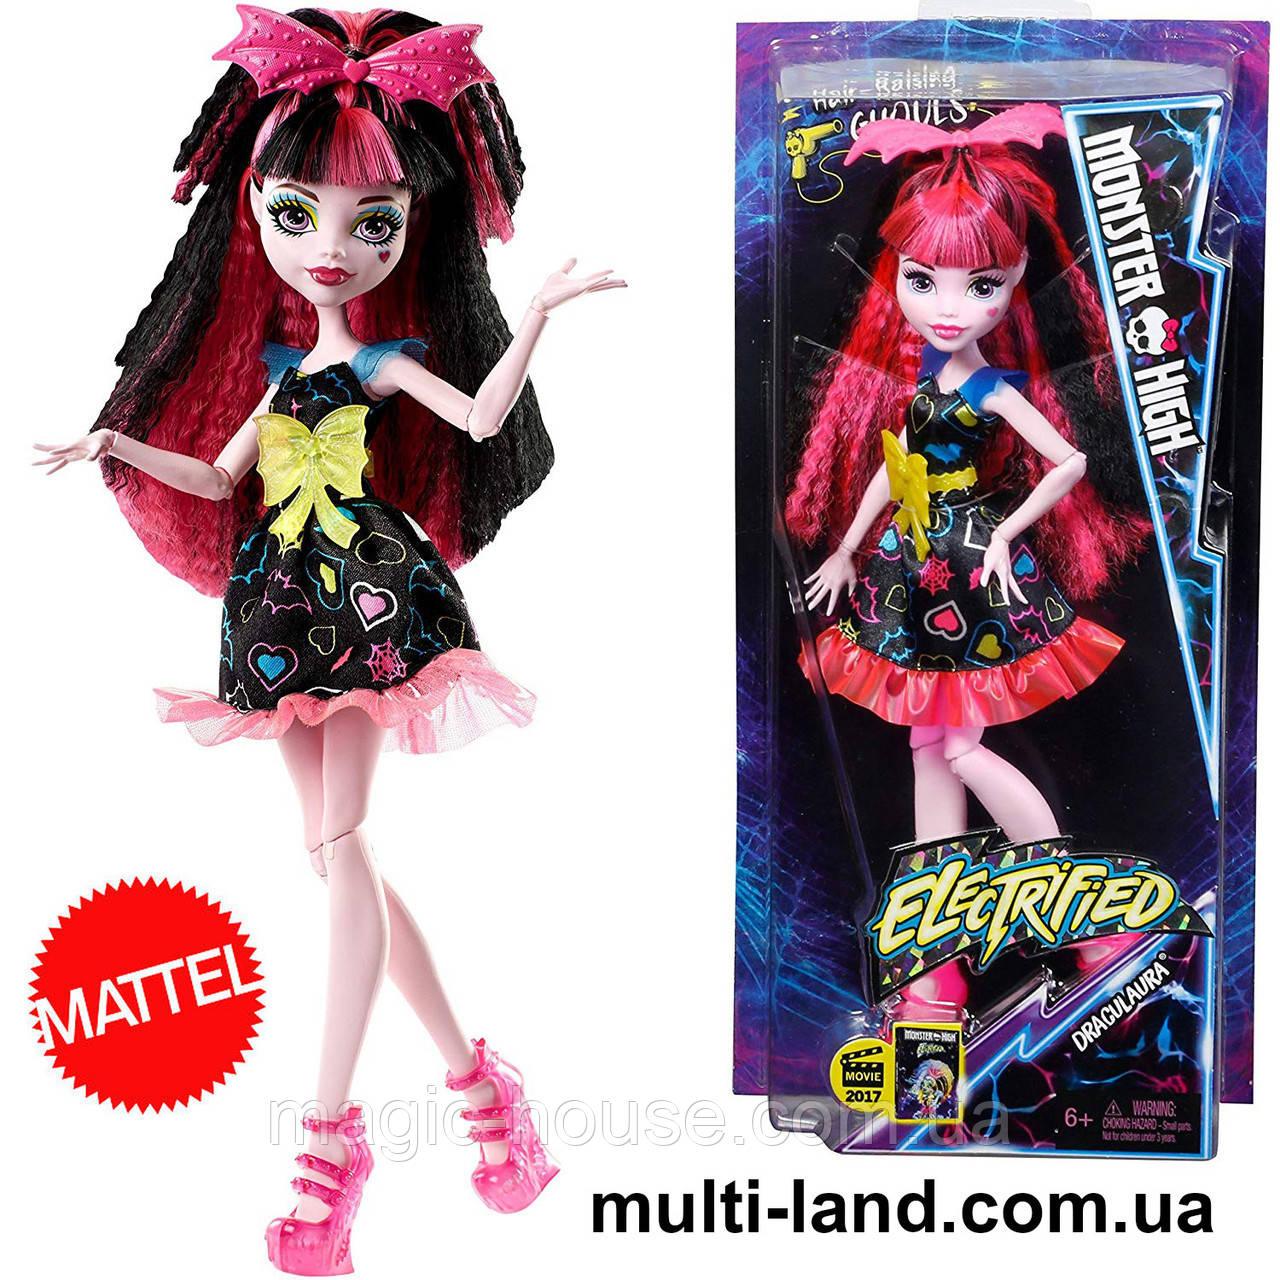 Дракулаура Под напряжением Кукла Монстер Хай Monster High Electrified Hair-Raising Ghouls Draculaura Doll